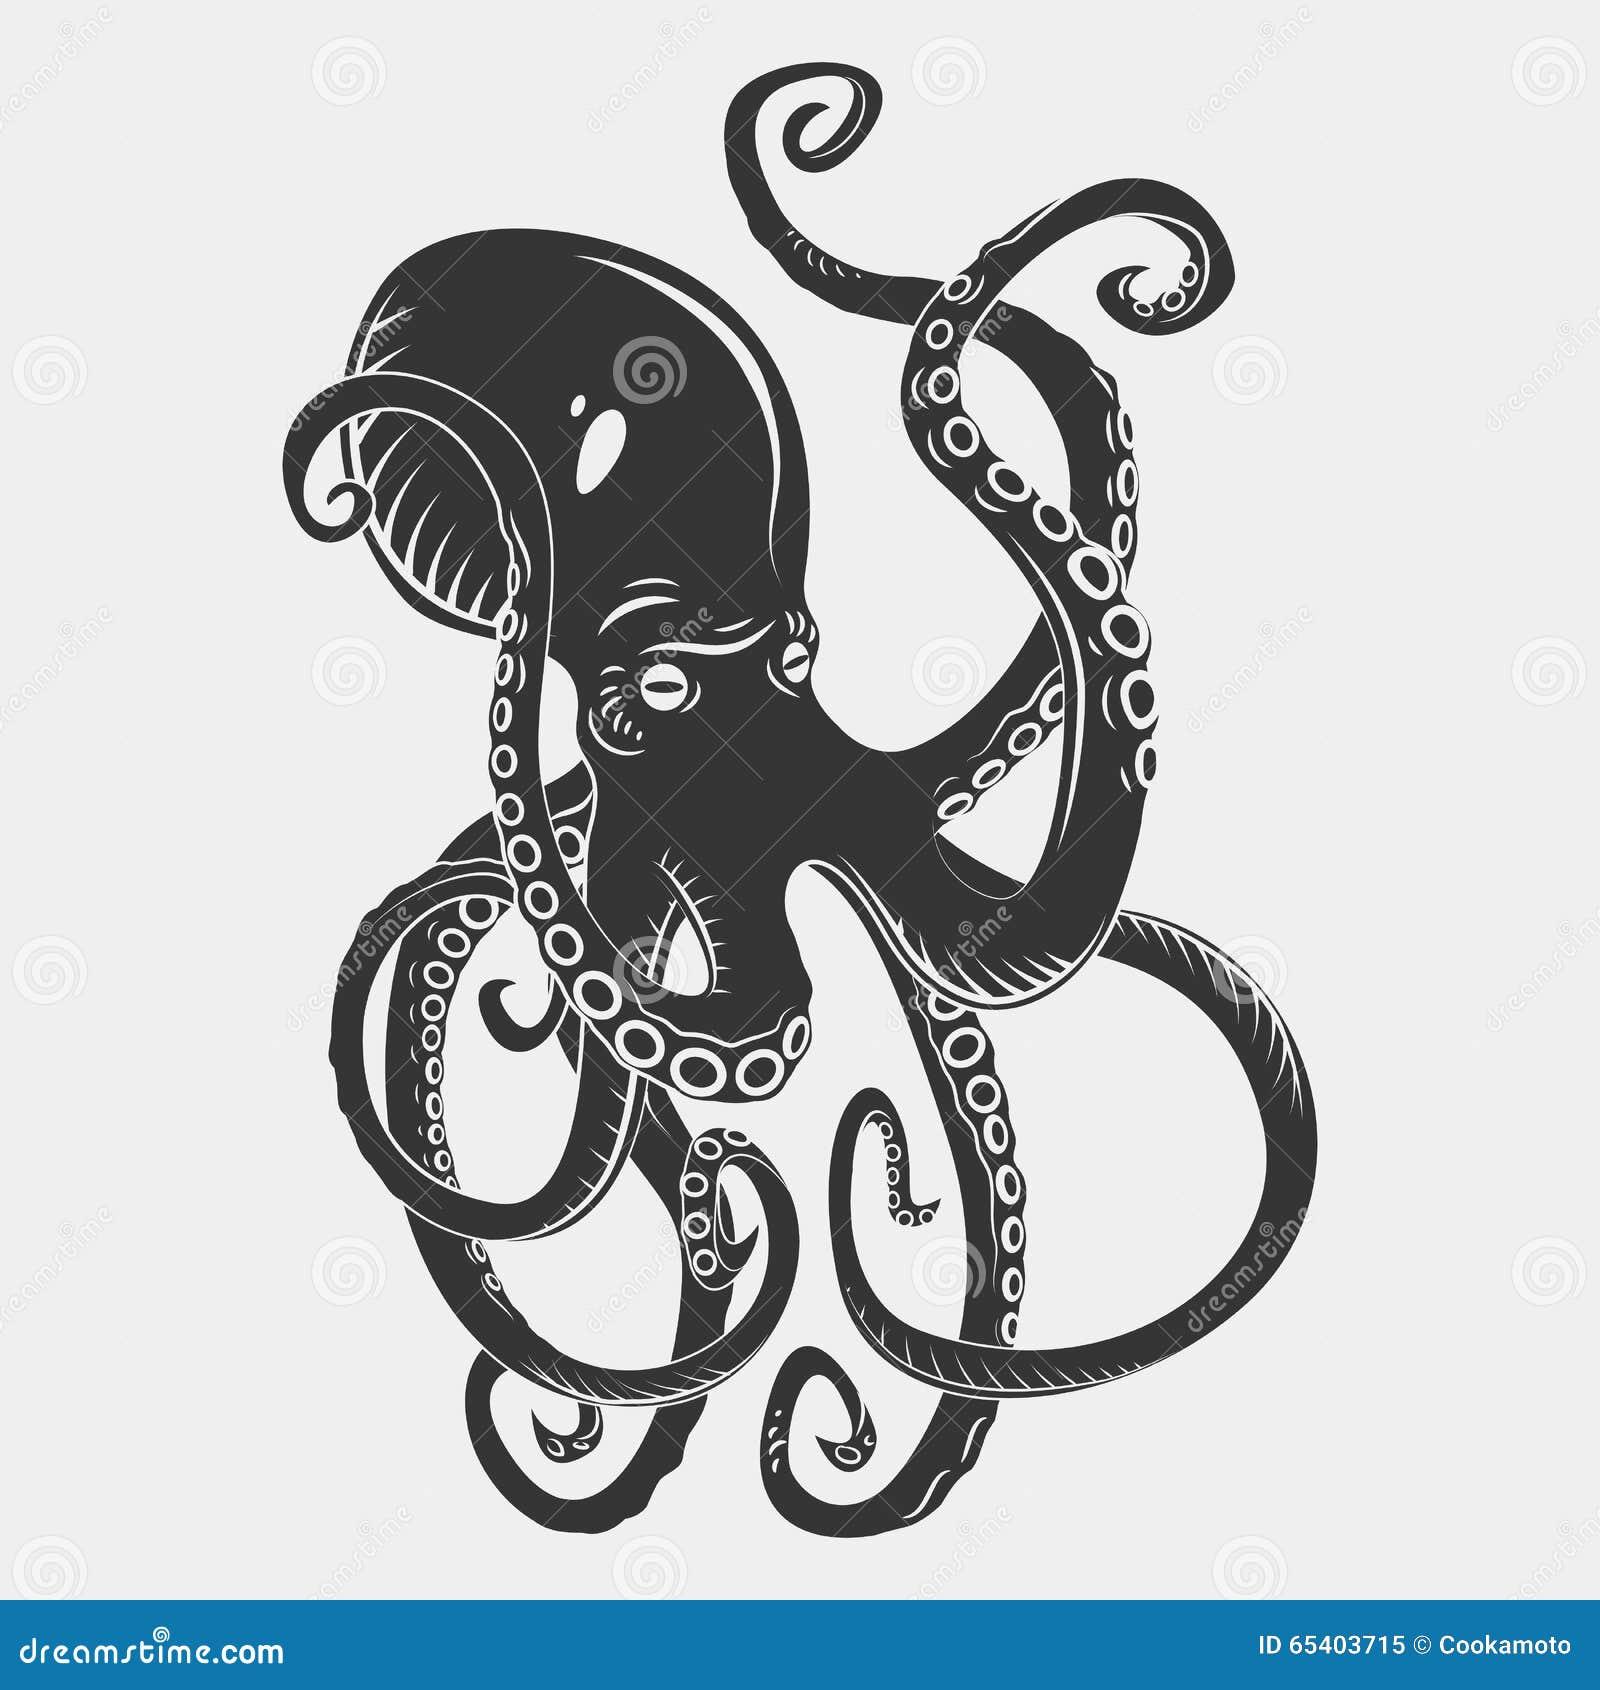 Black danger cartoon octopus characters with